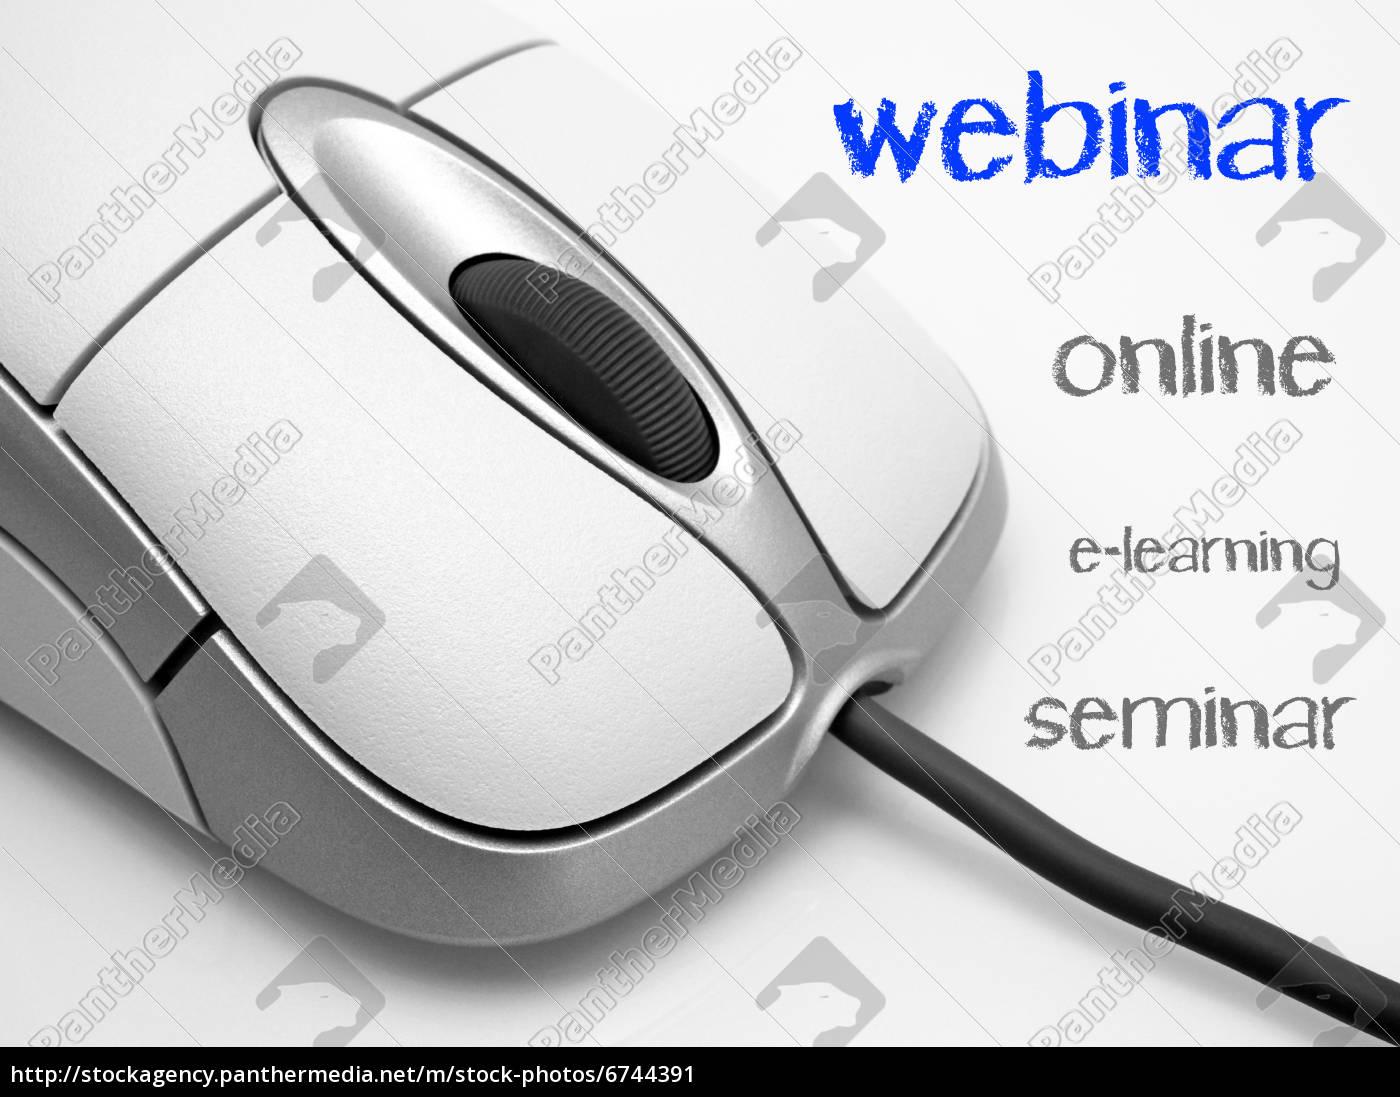 webinar, -, online, e-learning, seminar - 6744391